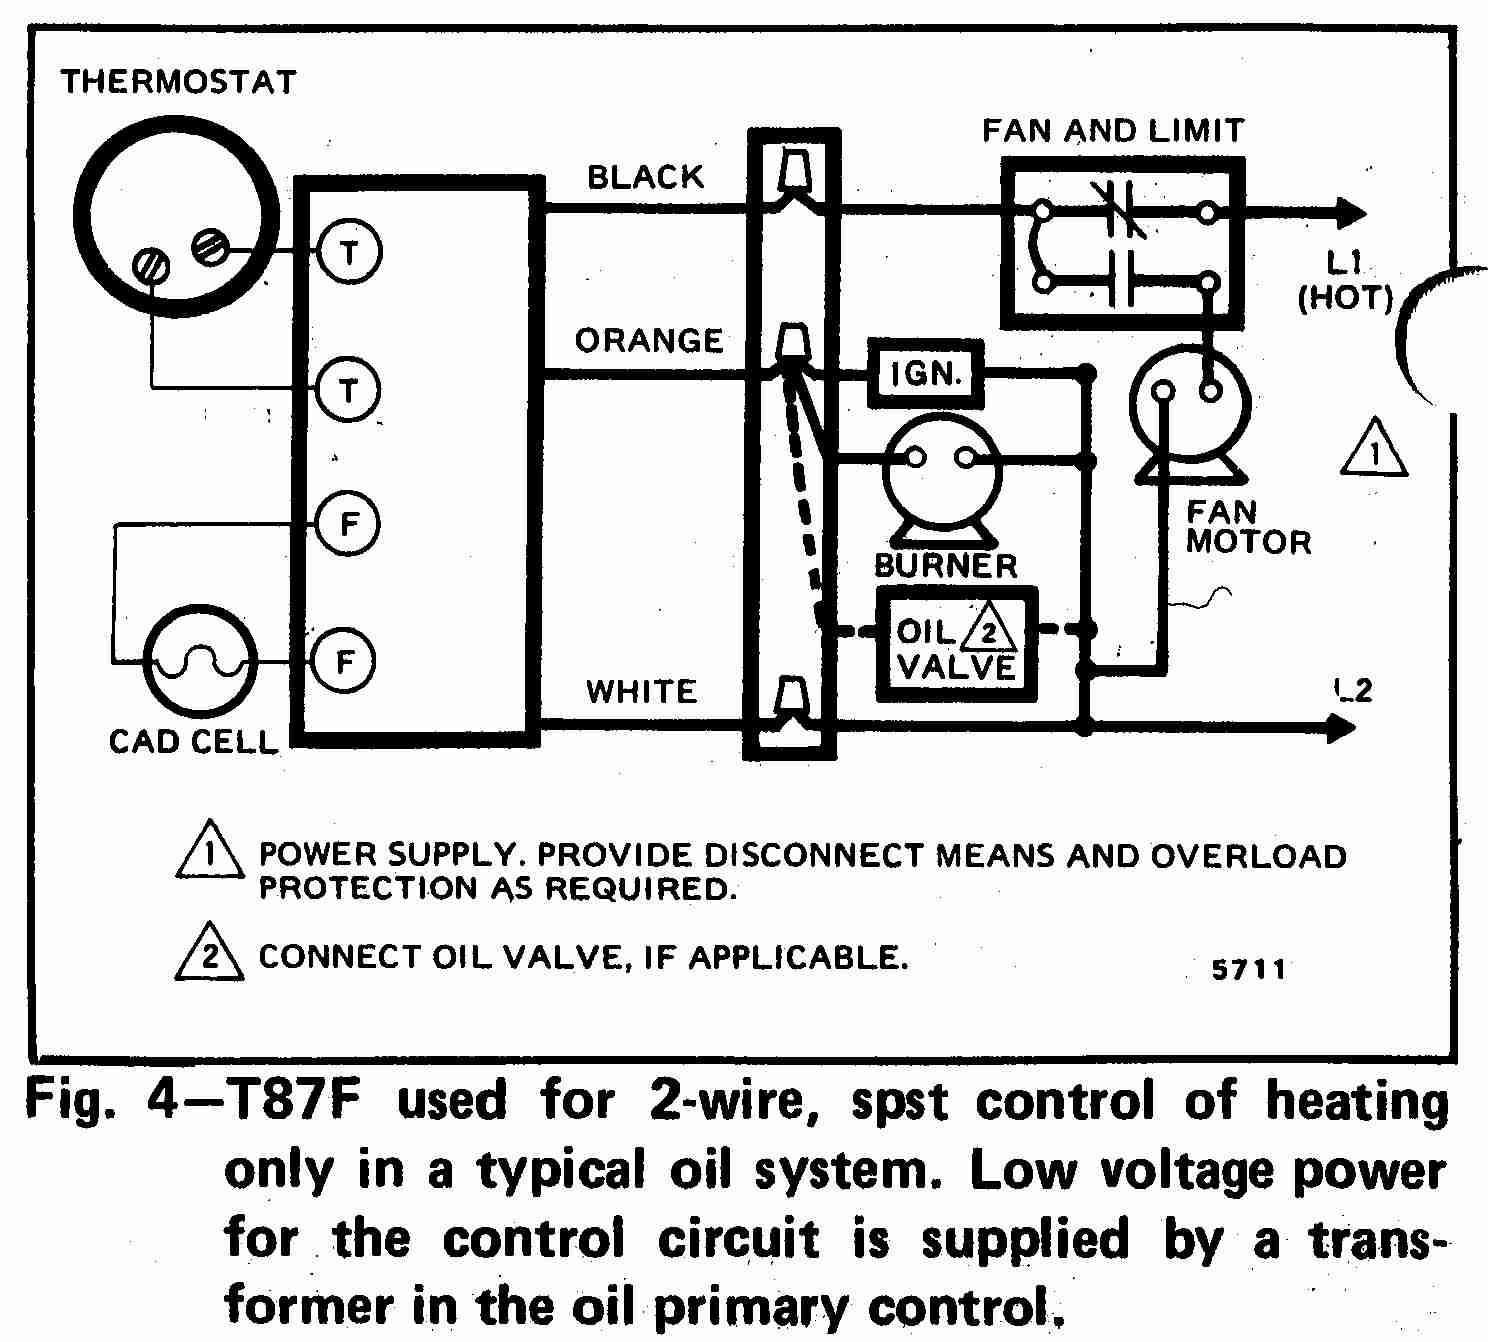 TT_T87F_0002_2W_DJF?resize=665%2C600&ssl=1 pa 28 wiring diagram wiring diagram  at readyjetset.co